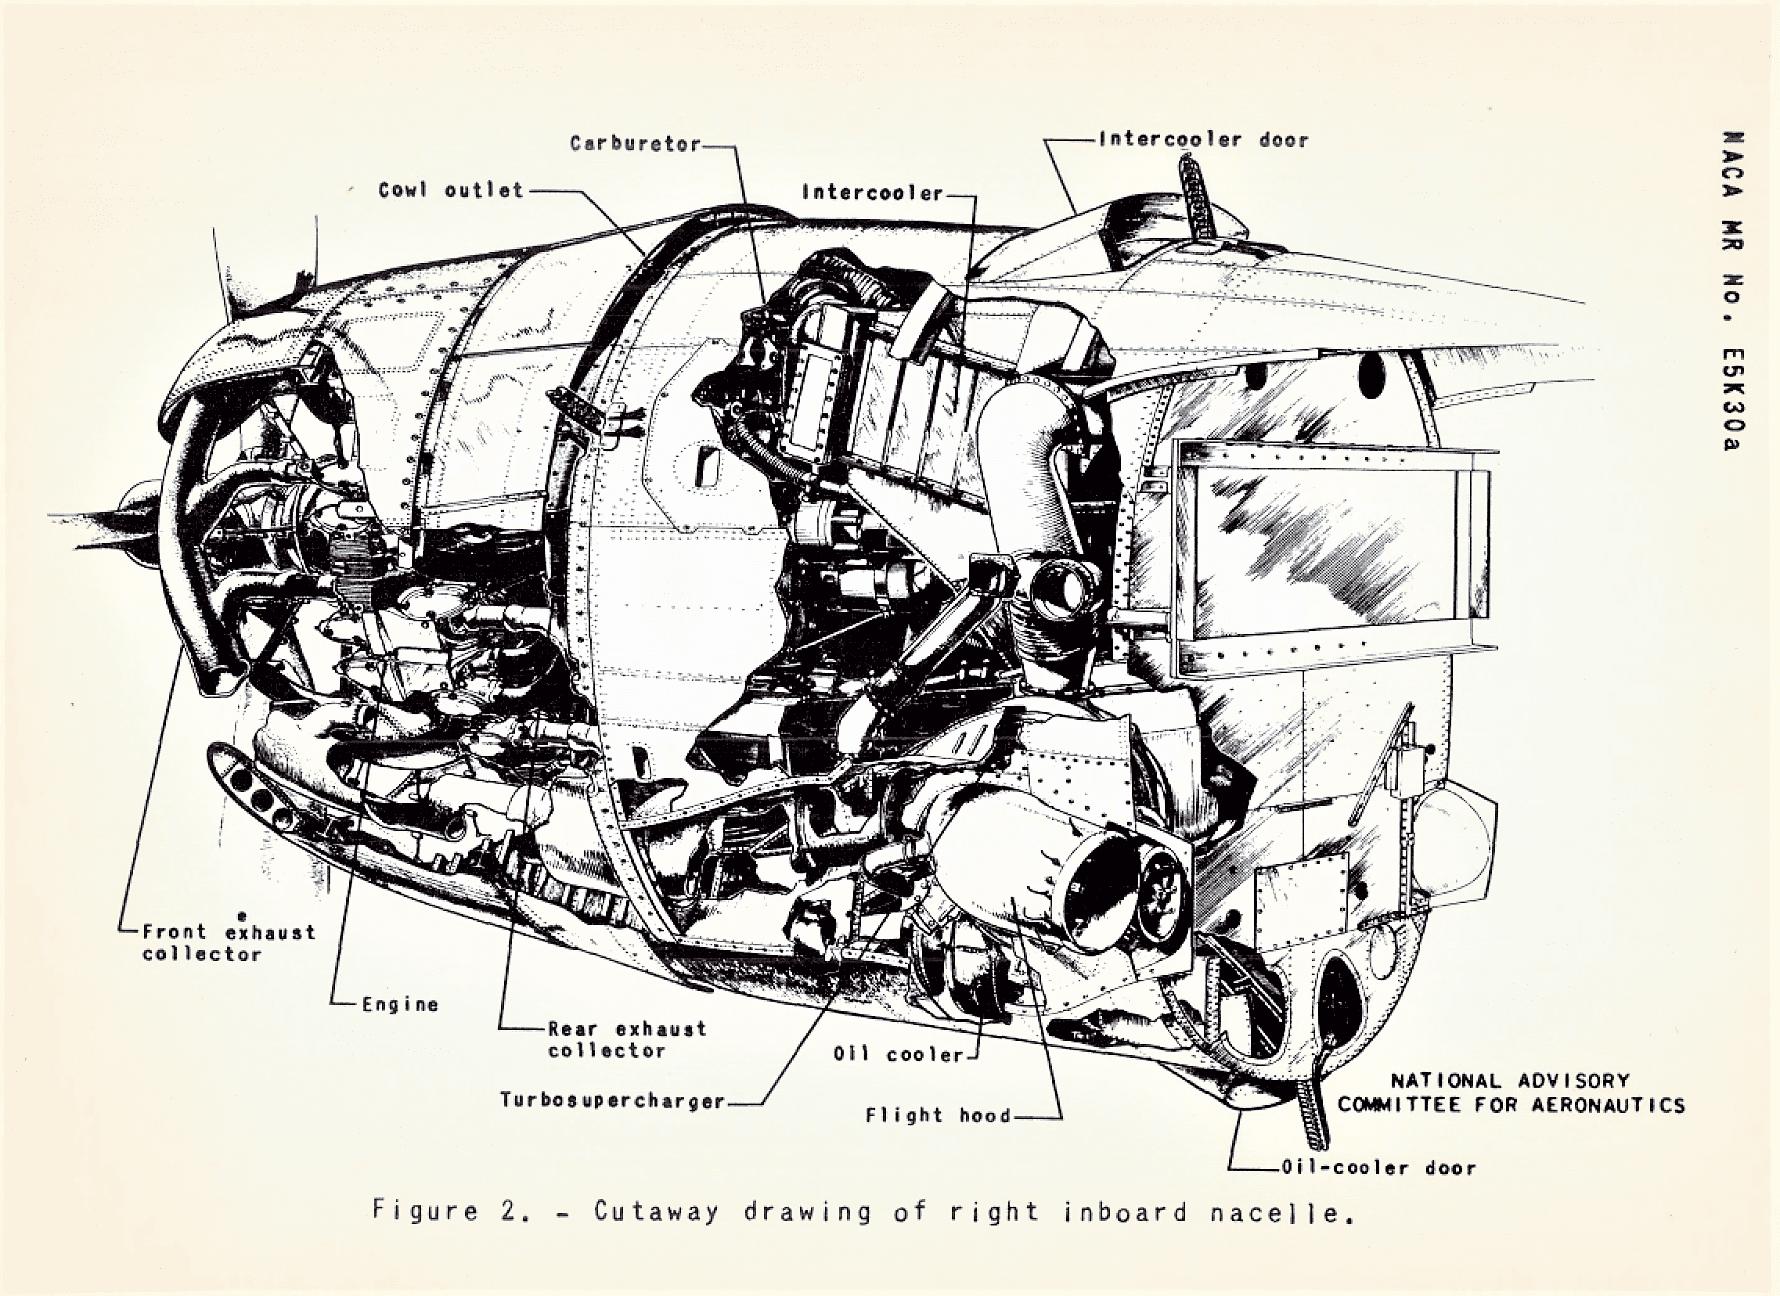 B 29 Engine Diagram - Wiring Diagrams Recent Westinghouse Golf Cart Wiring Diagram on